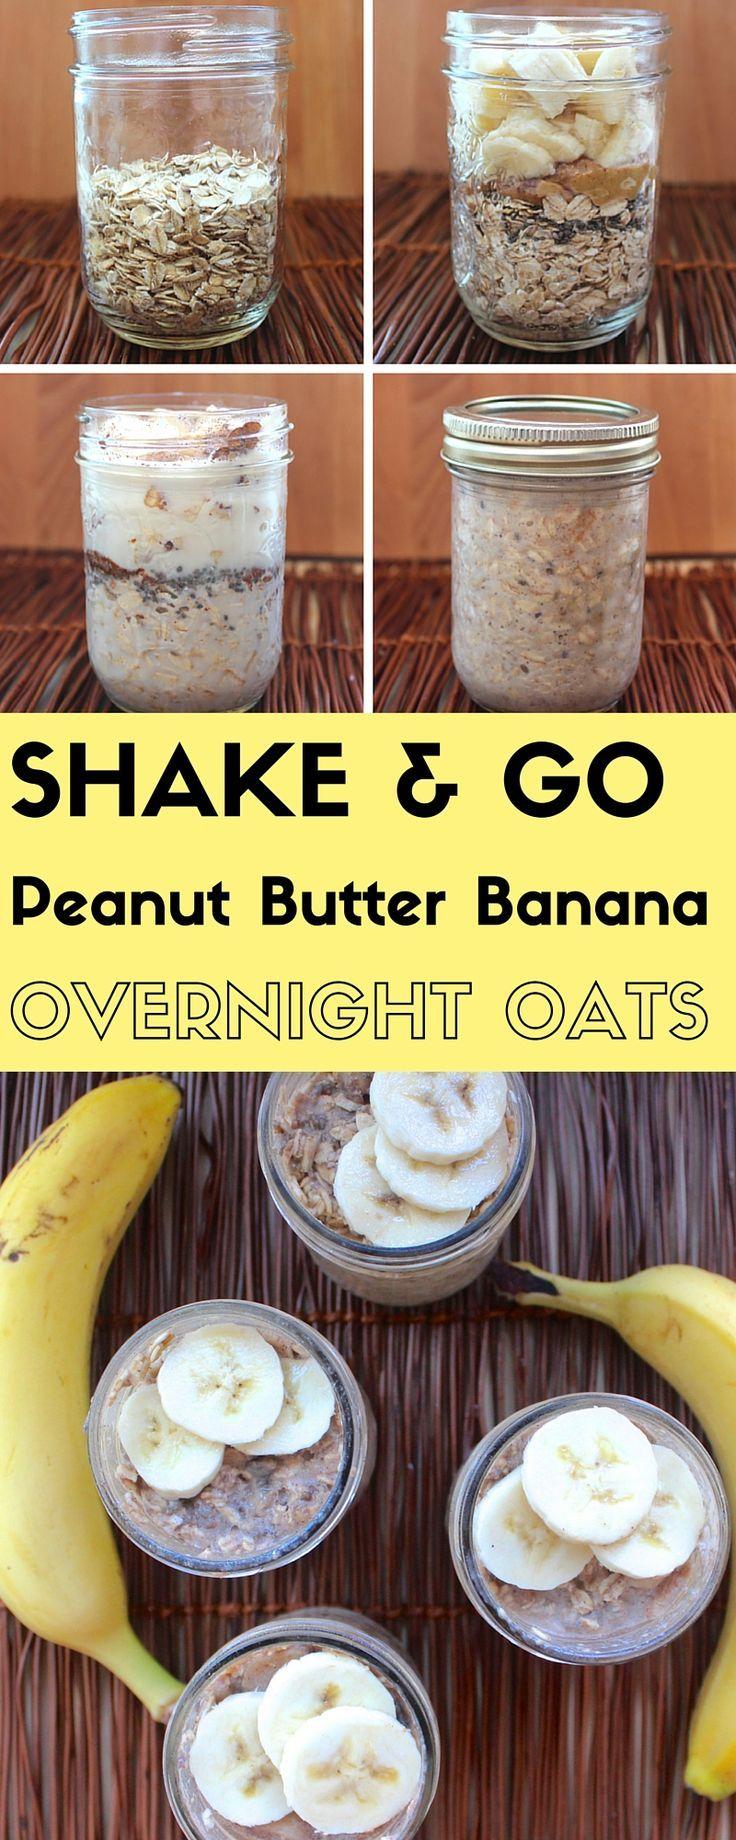 Shake & Go Peanut Butter Banana Overnight Oats; a high-protein easy #vegan breakfast from http://TwoGreenPeas.com